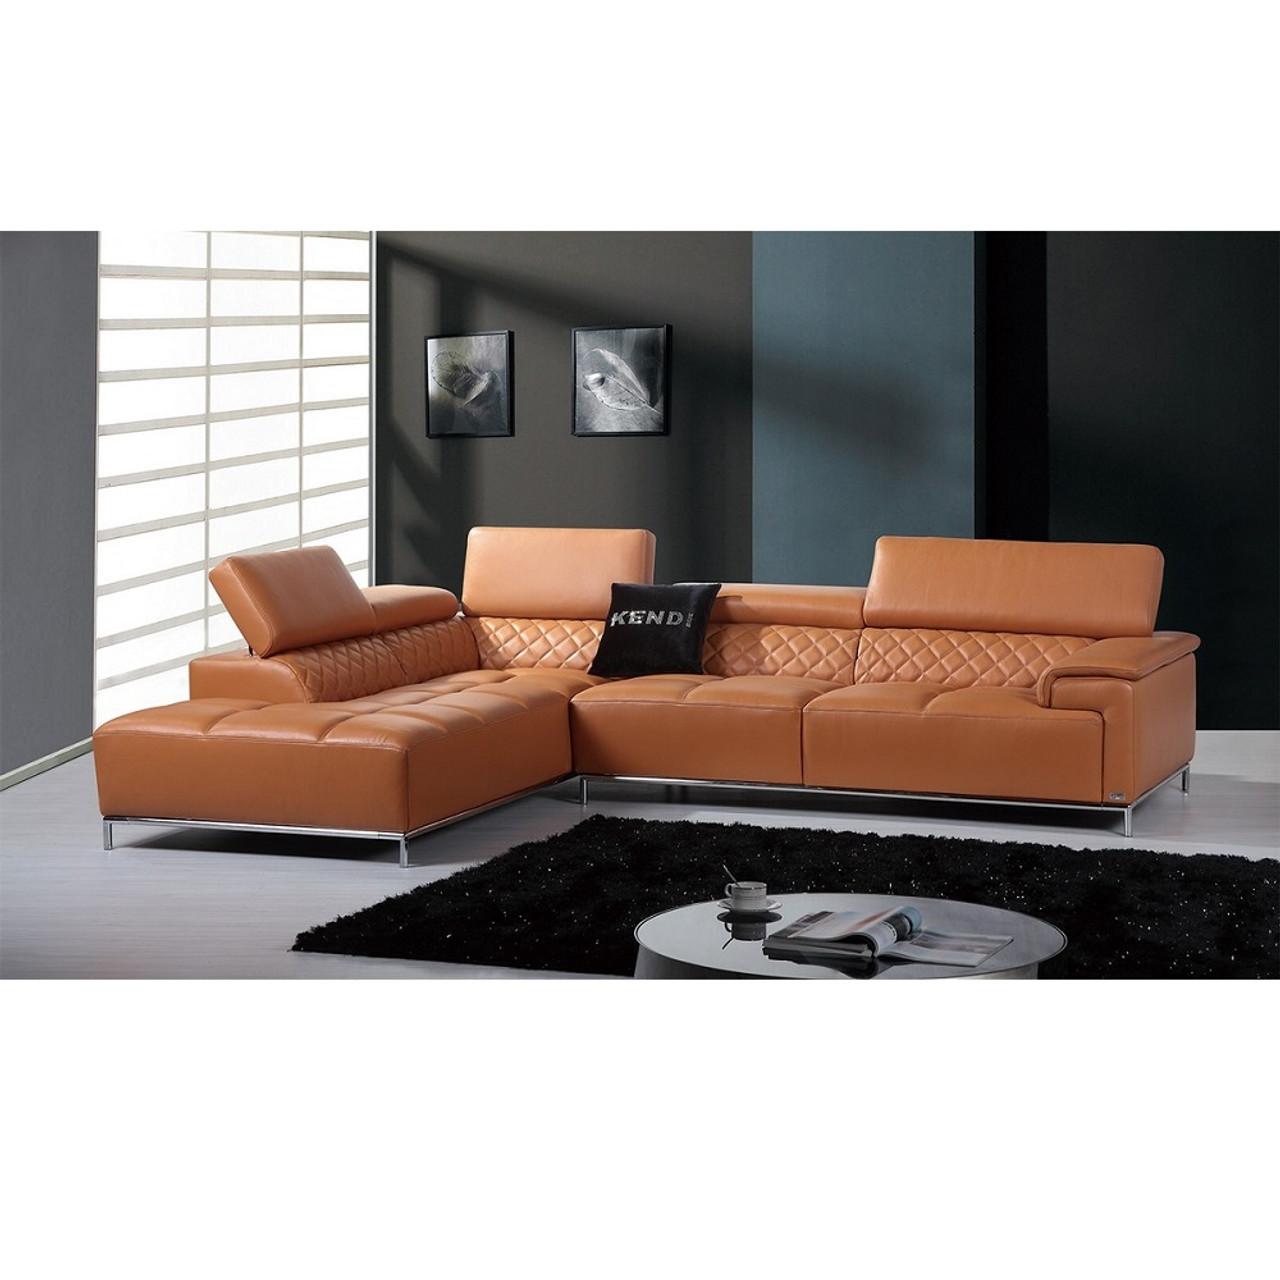 Divani Casa Citadel Modern Orange Italian Leather Sectional Sofa ...